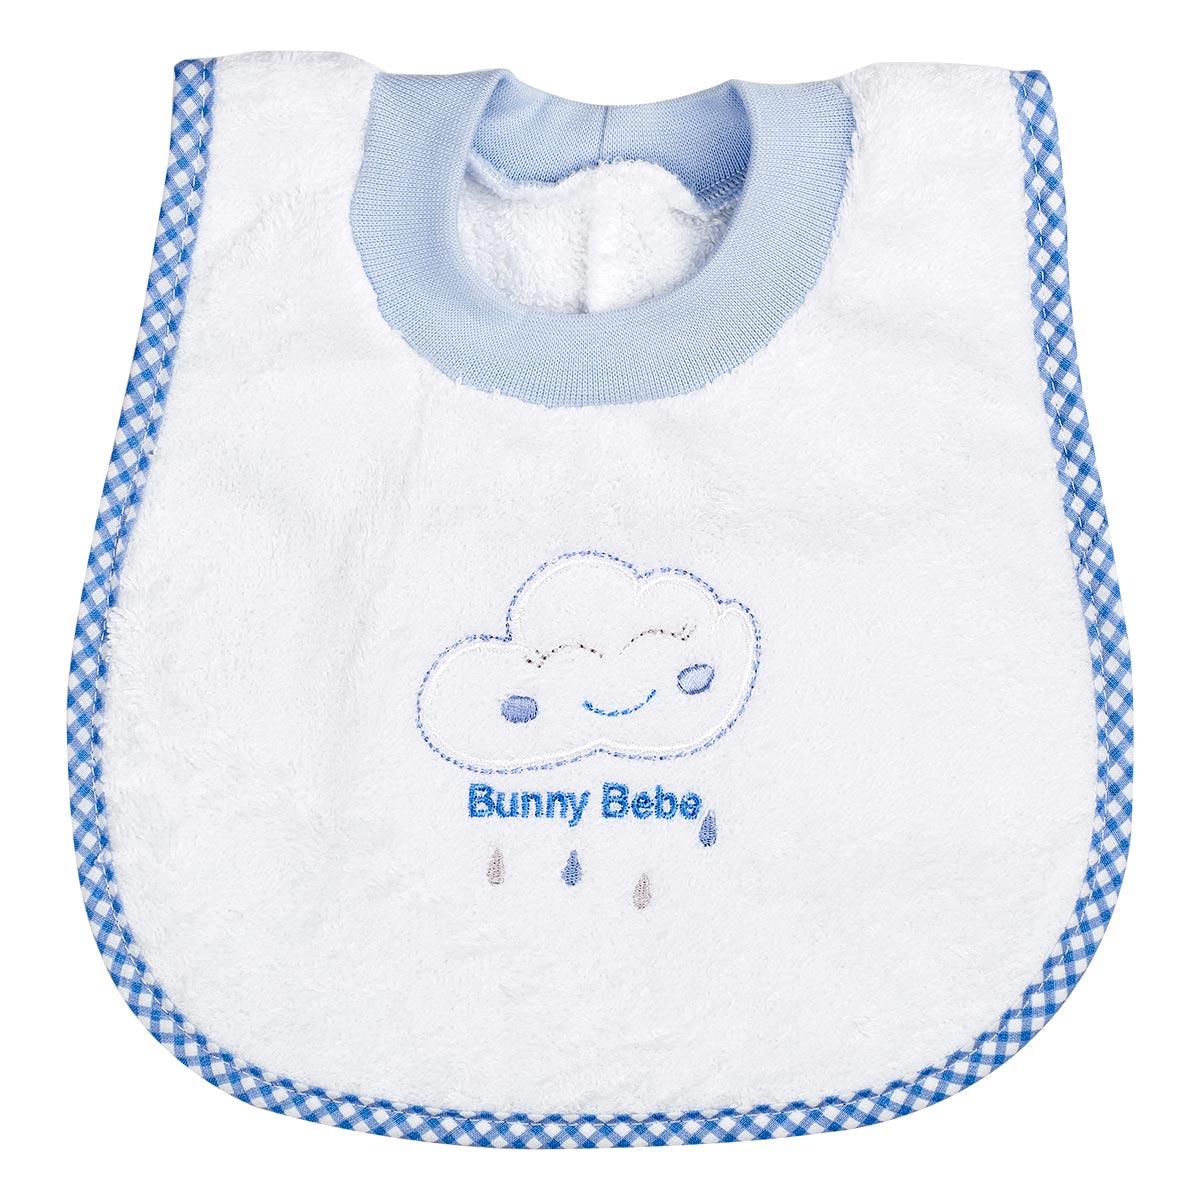 "Bunny bebe σαλιάρα πετσετέ ""ποδίτσα"" σύννεφο μπλε"